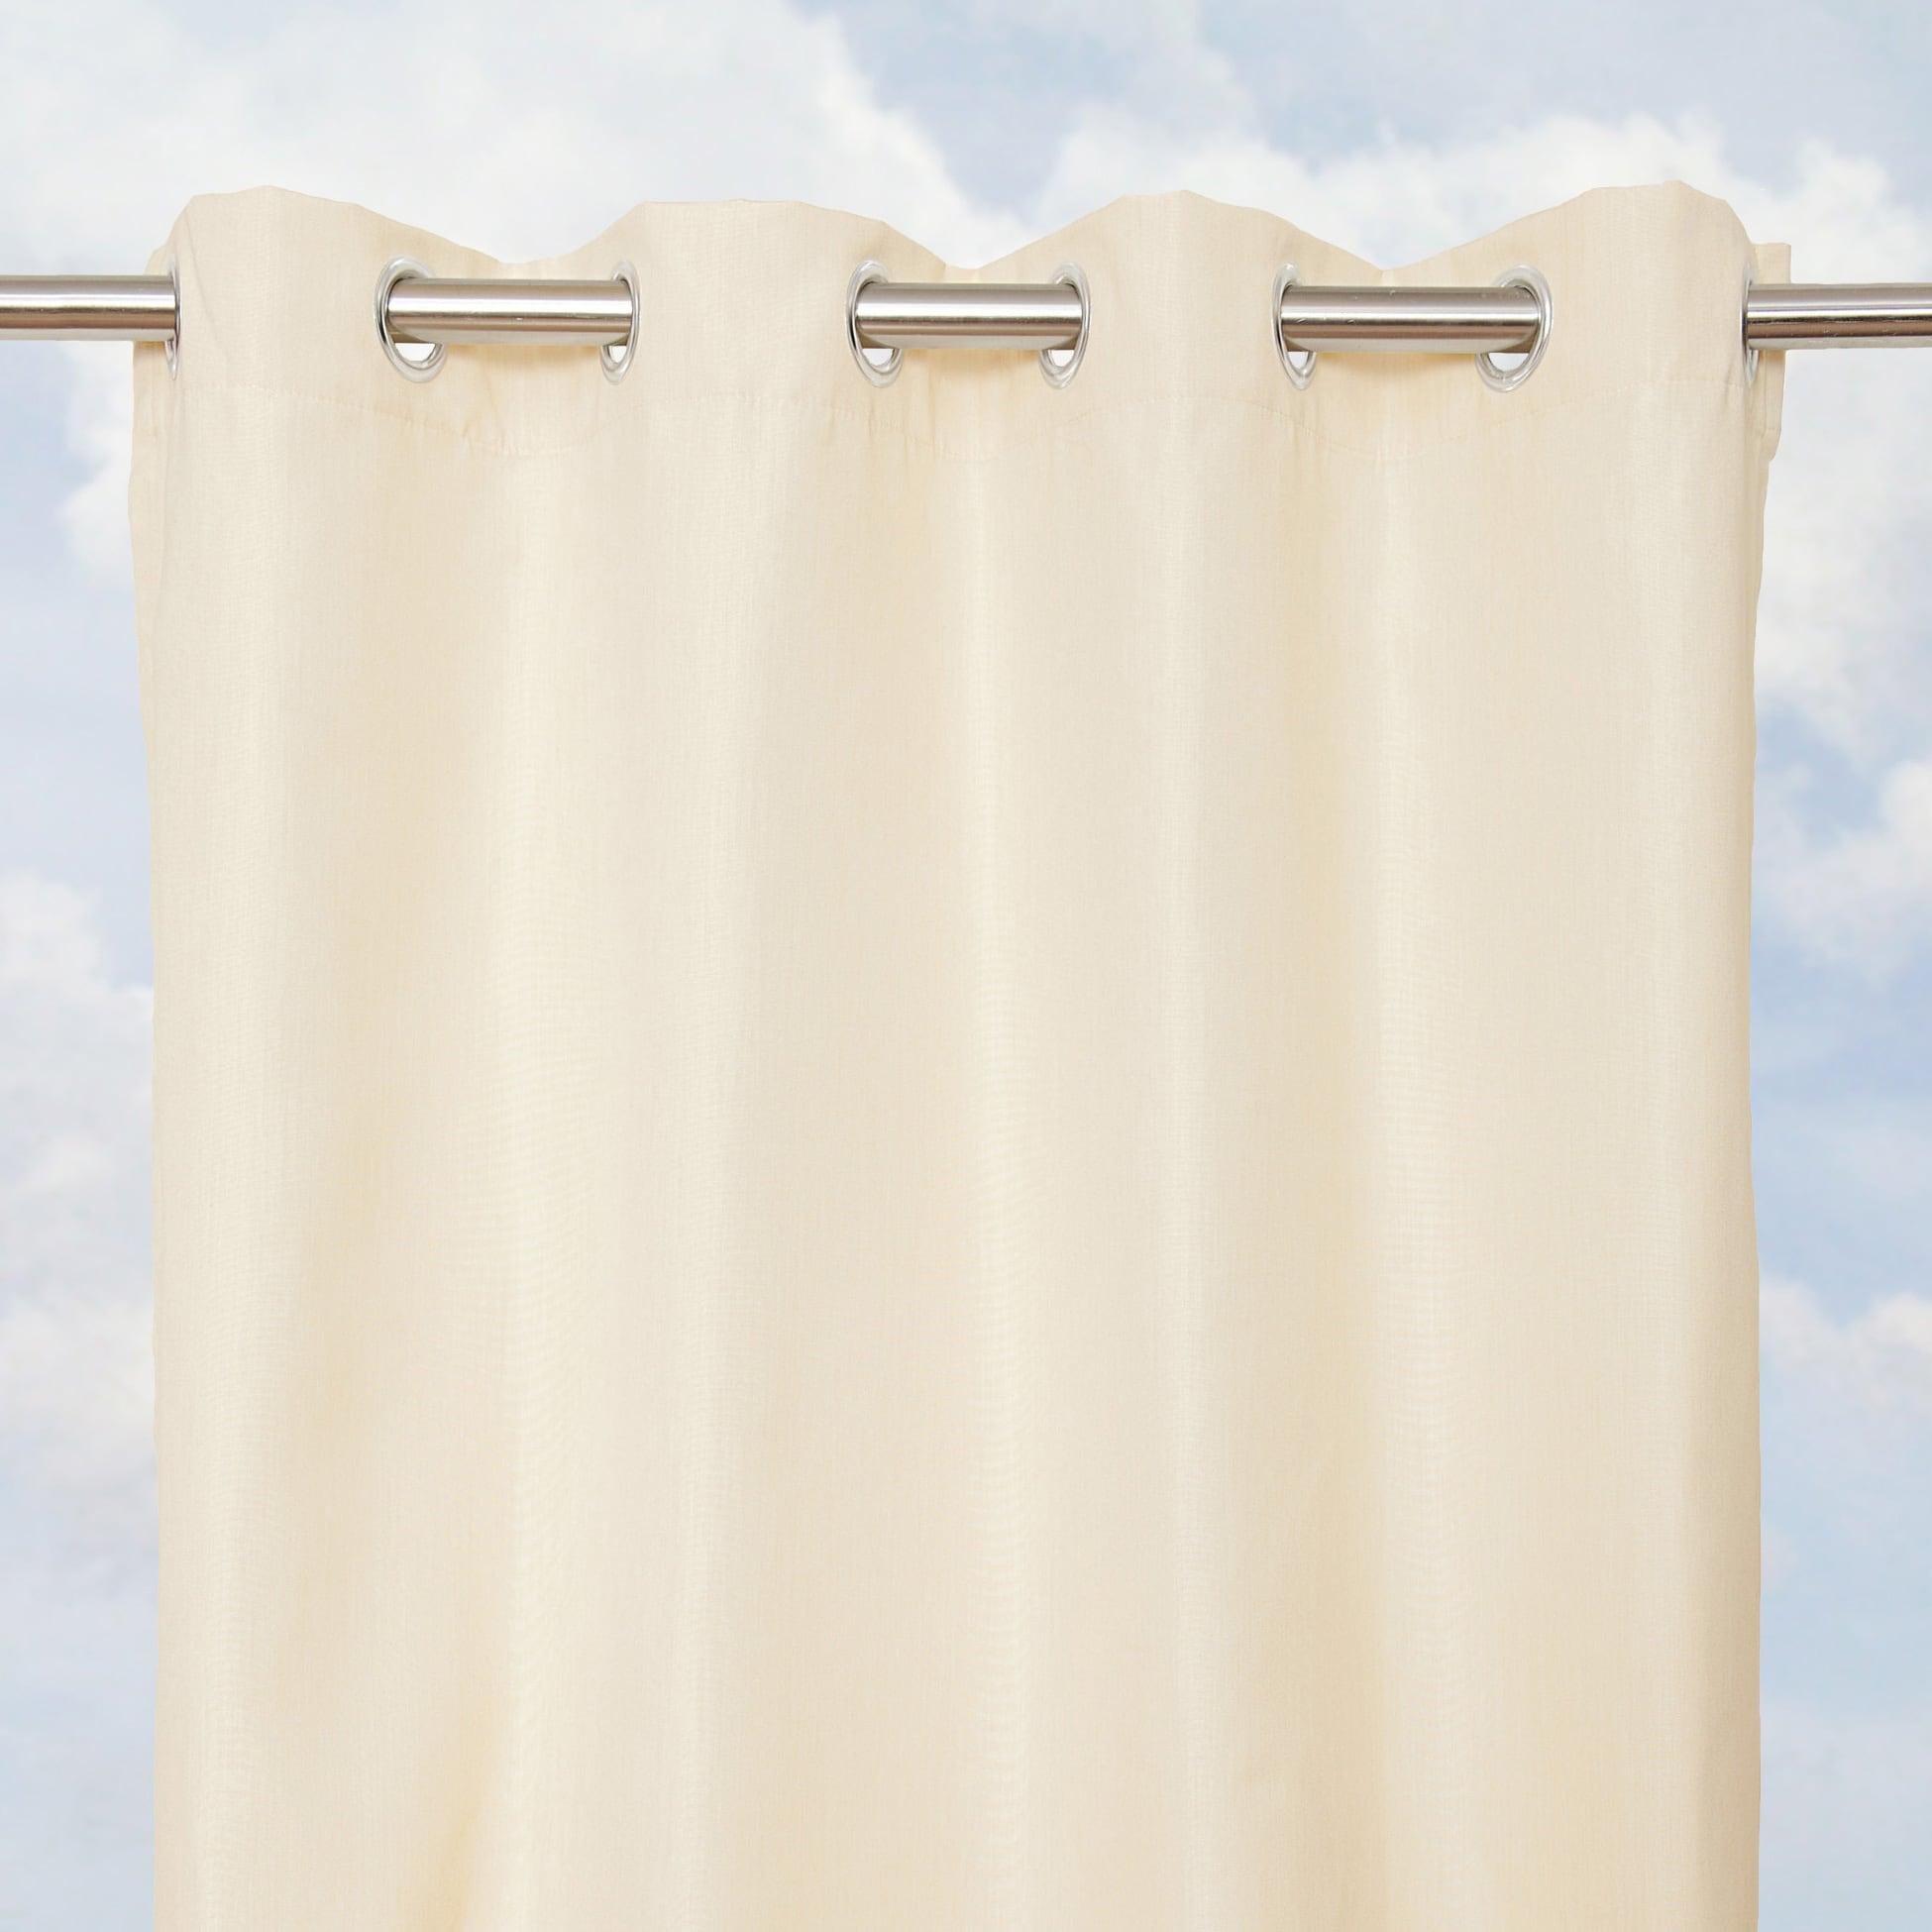 Sunbrella Bay View Vellum 84-inch Outdoor Curtain Panel